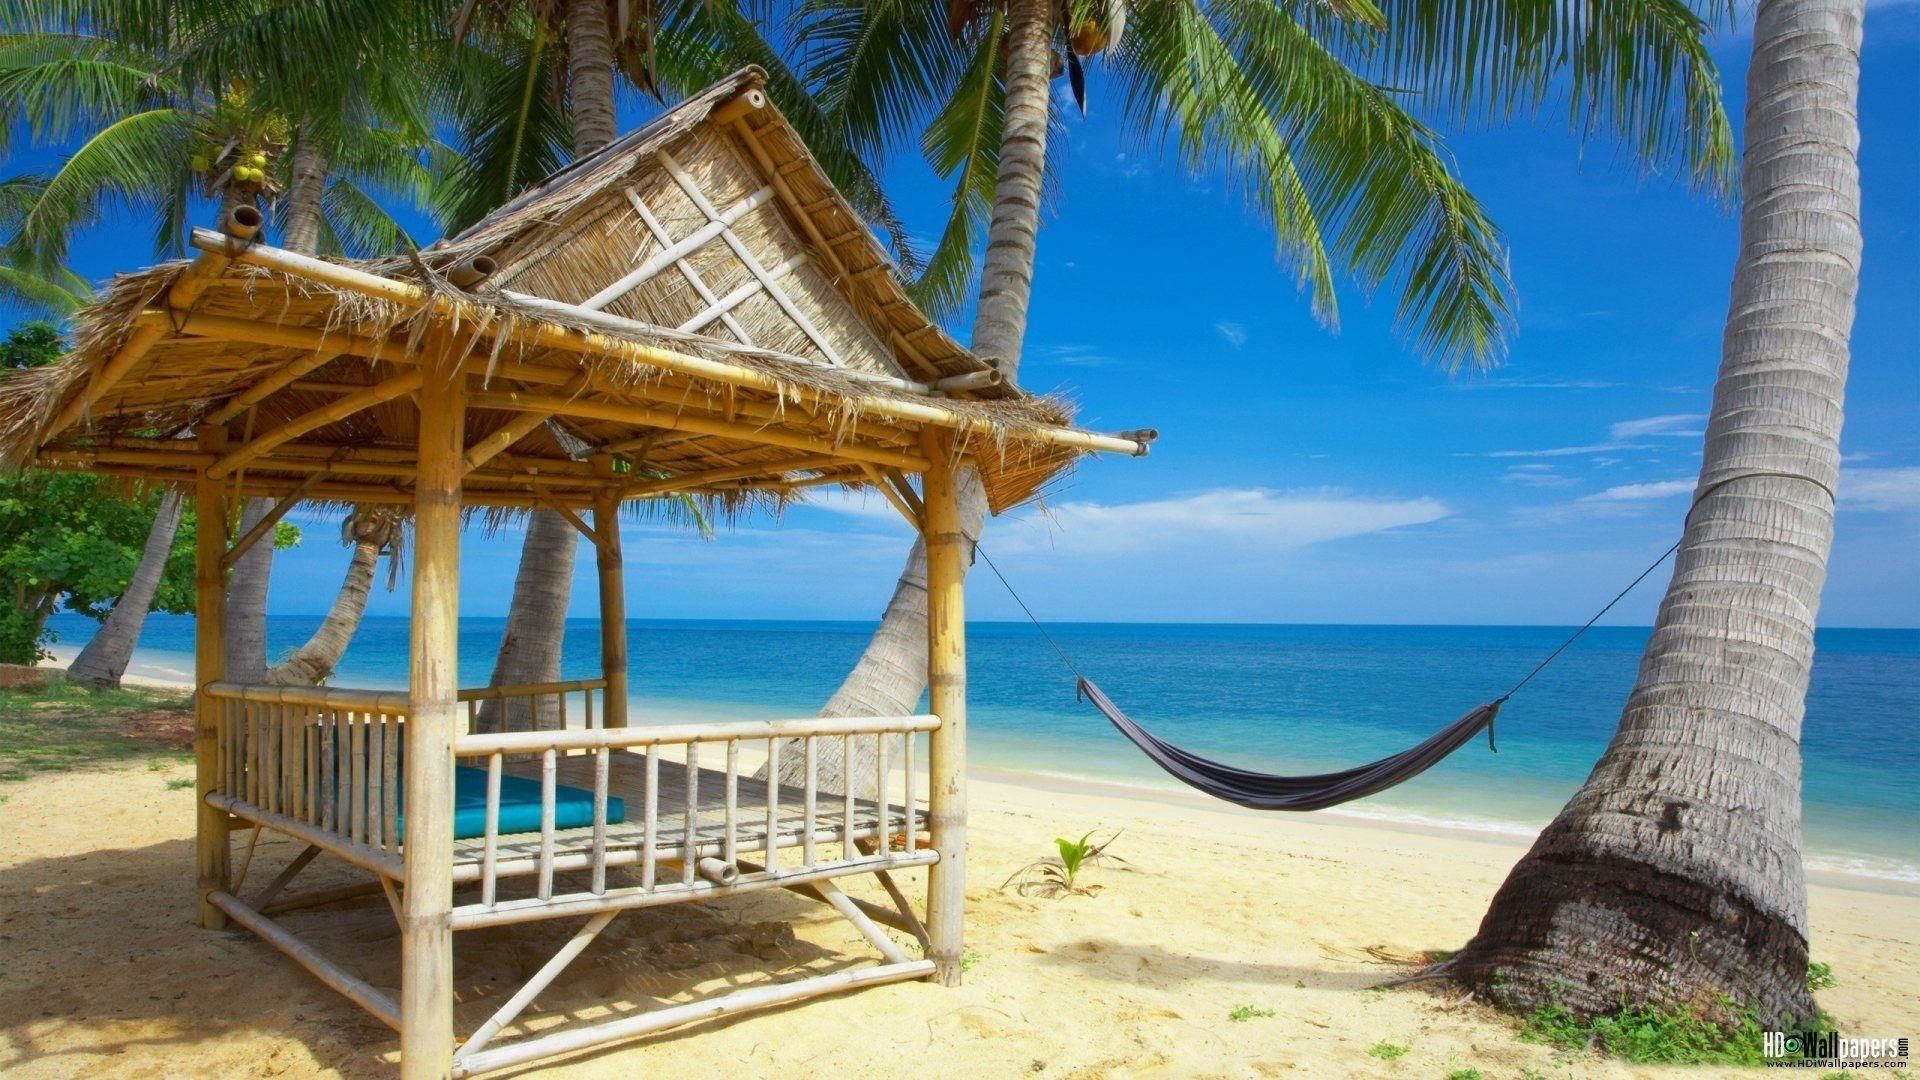 Tropical Beach Resort Wallpapers for Desktop Background Full ...